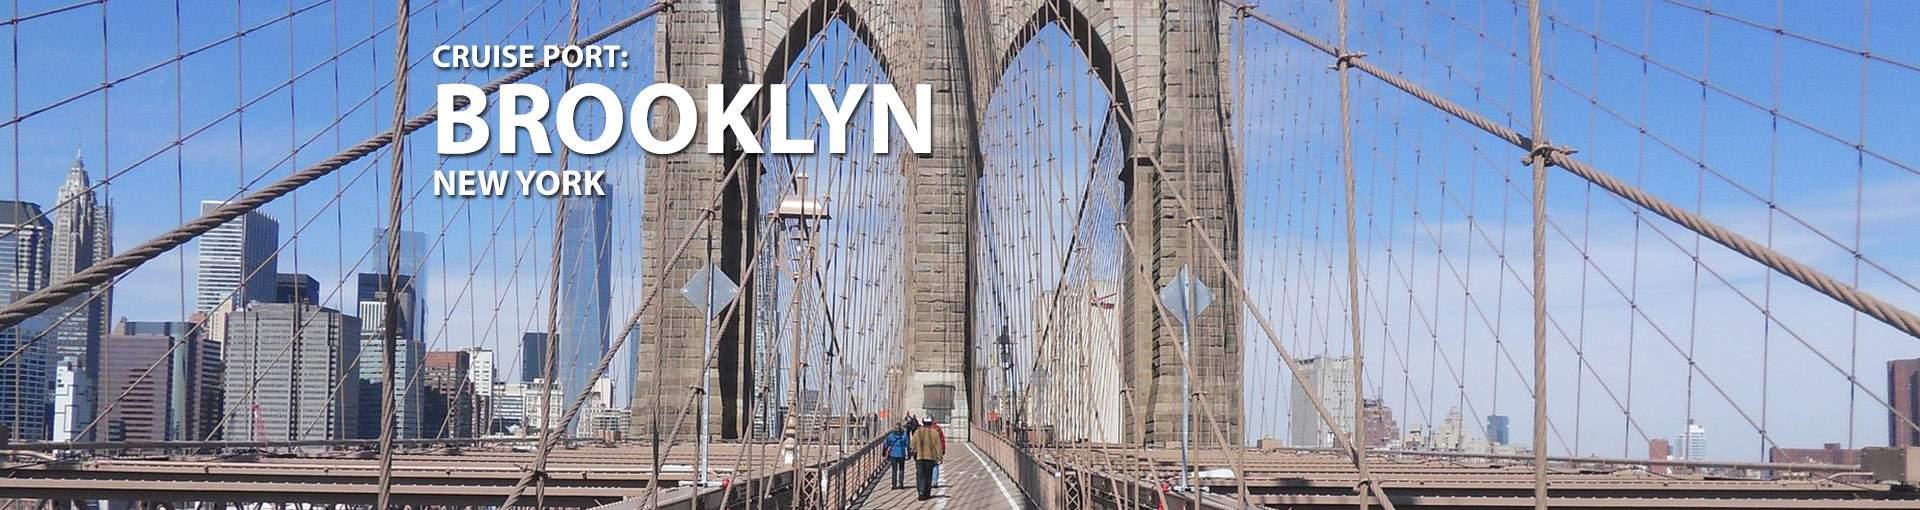 Brooklyn, New York Cruise Port